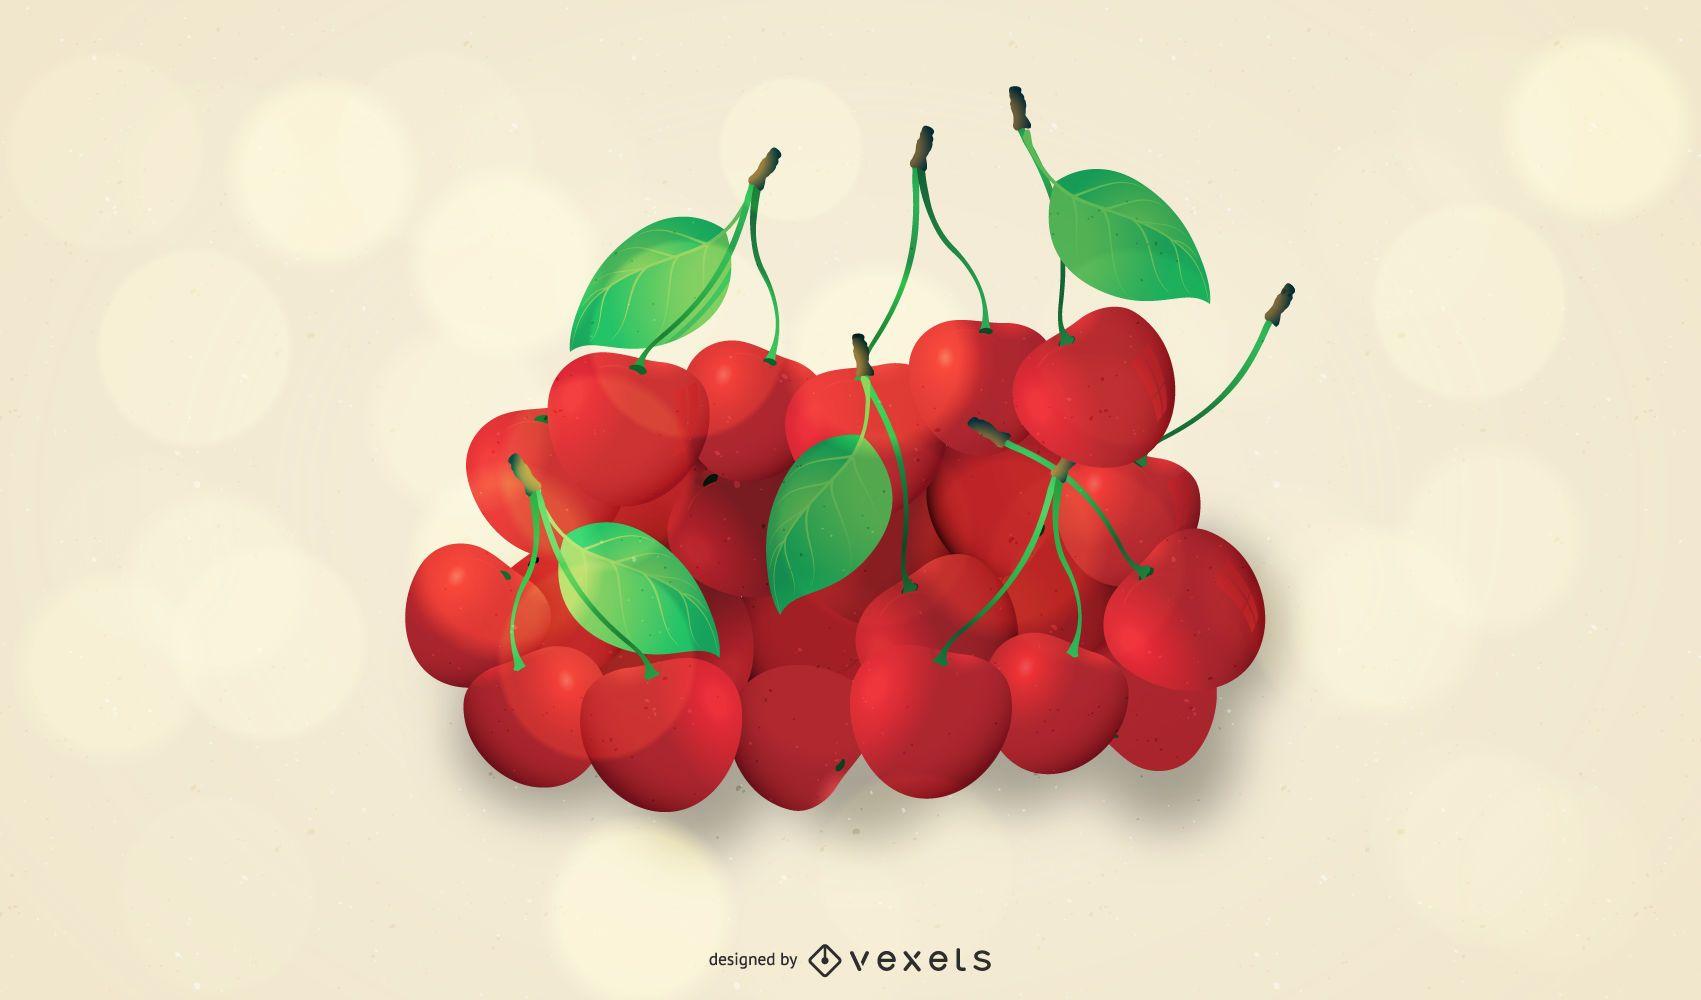 Colina de jugosas cerezas frescas